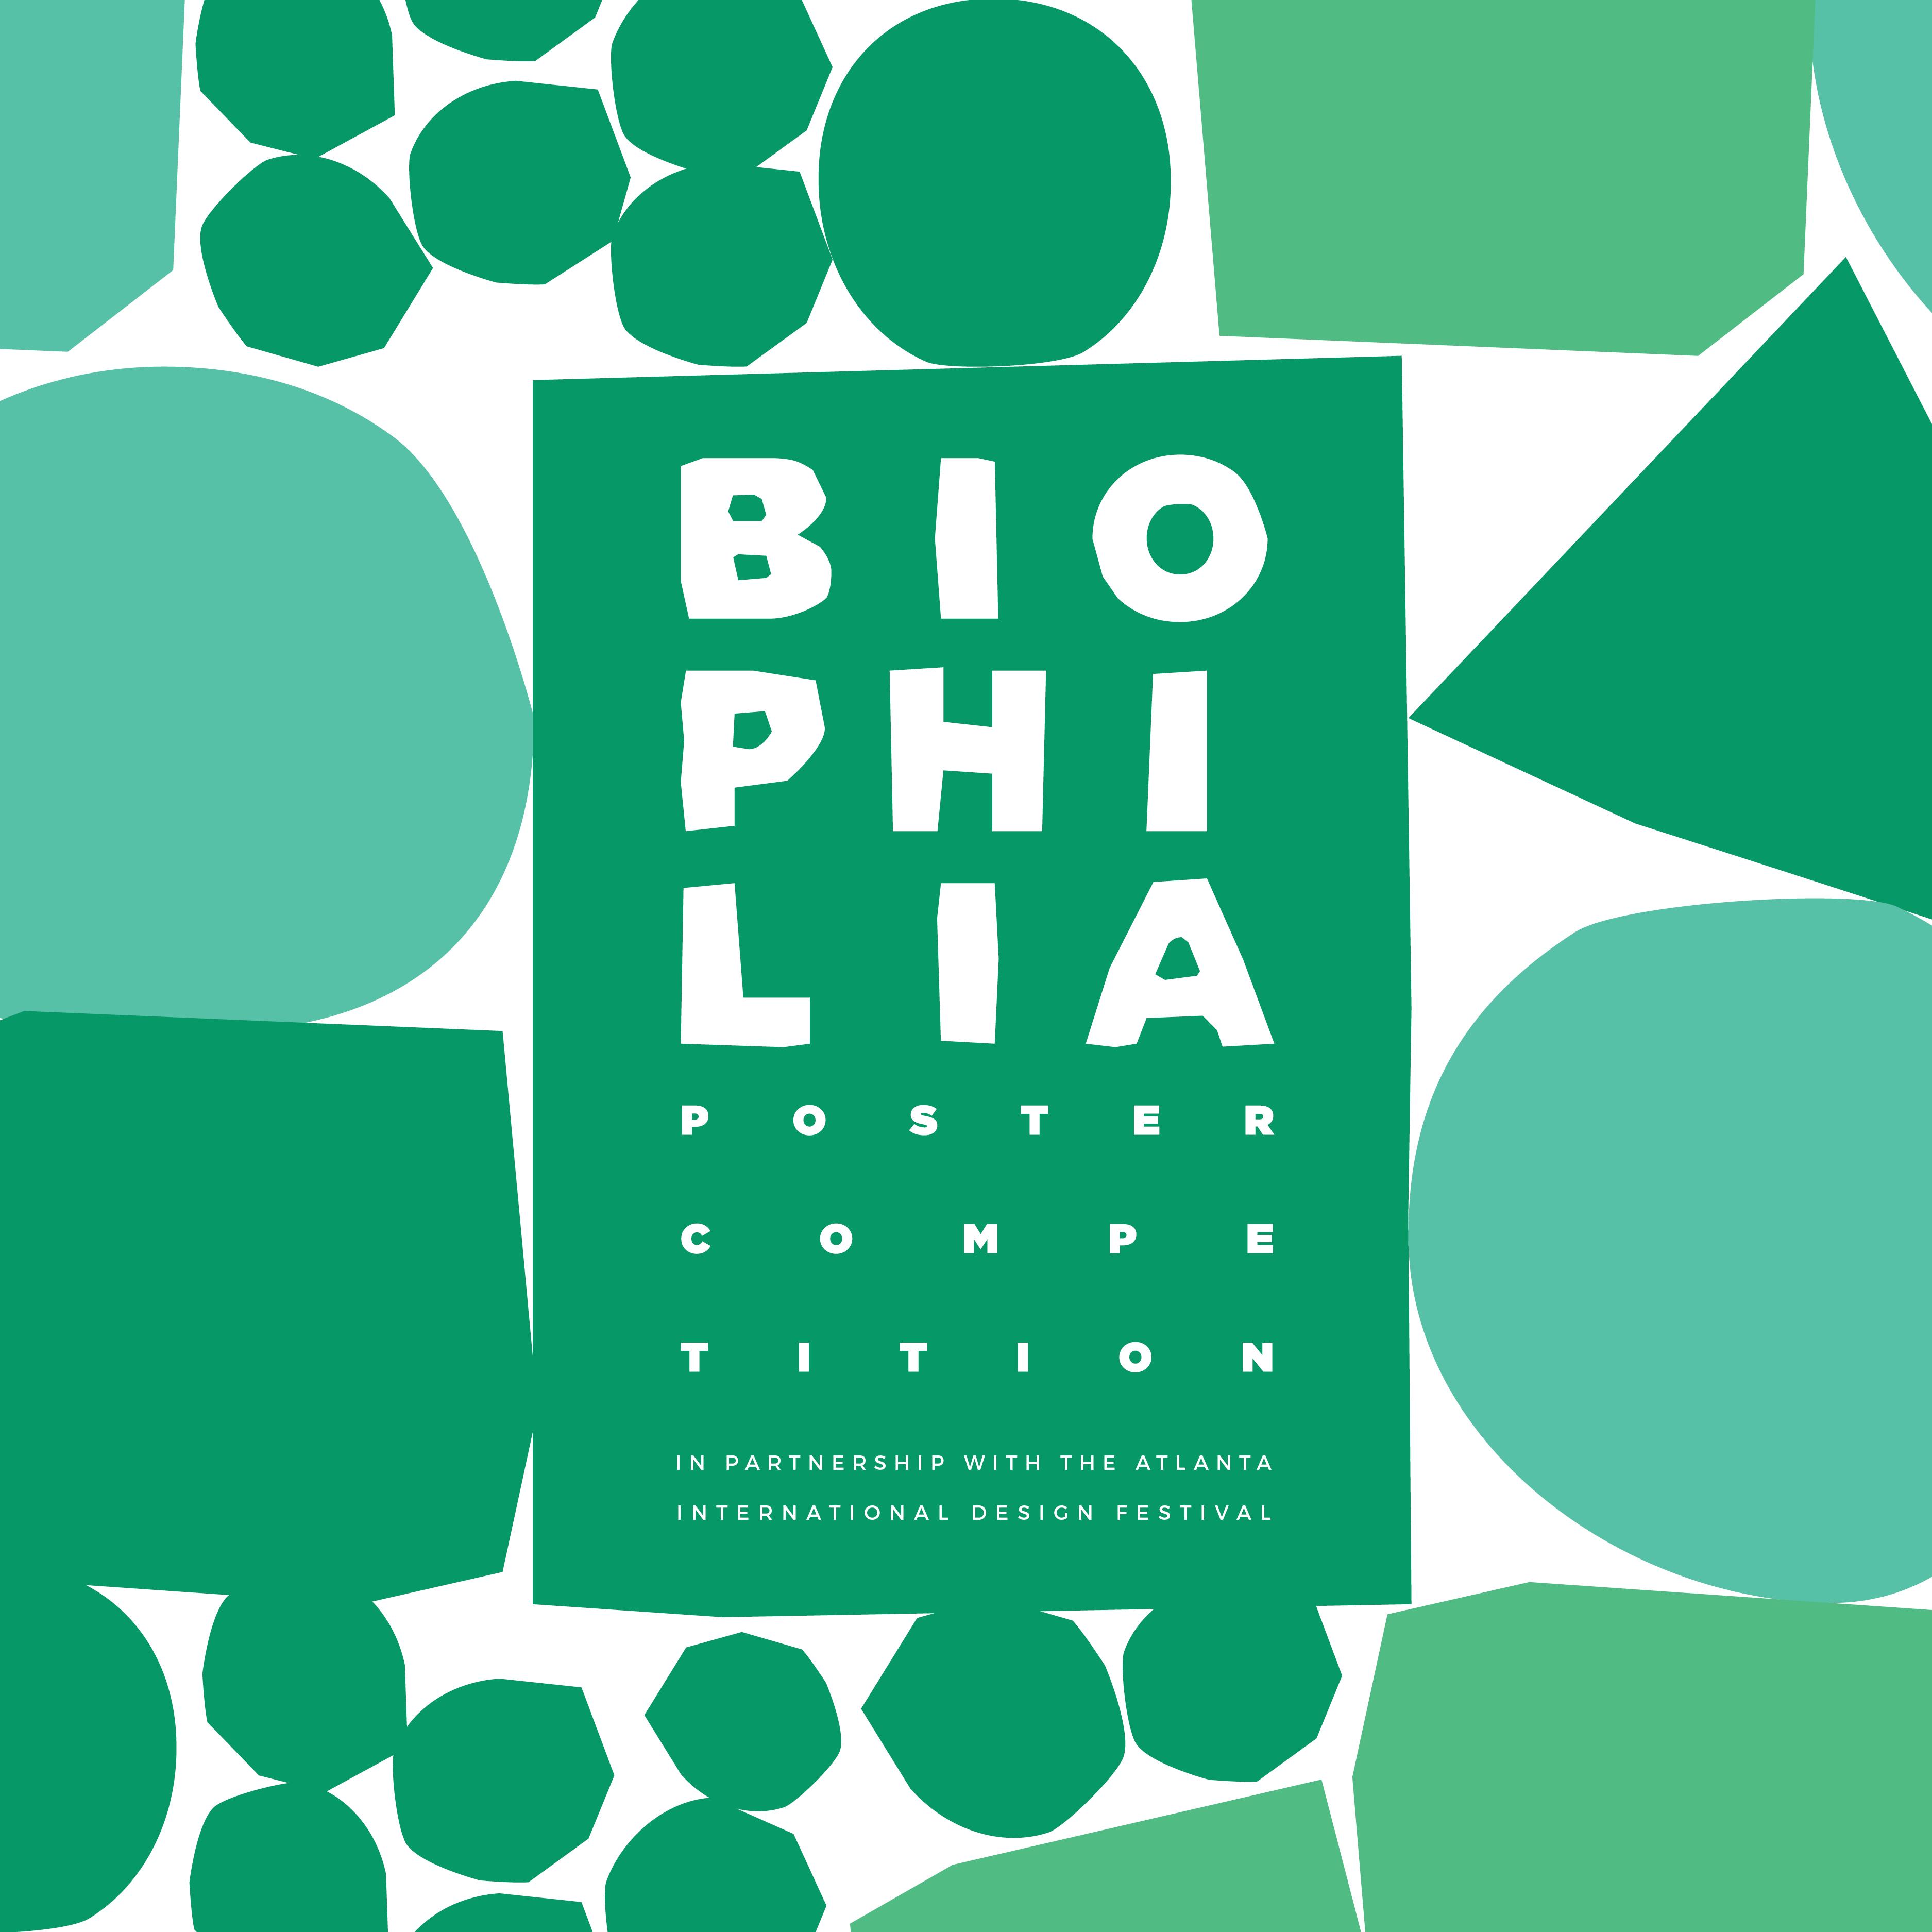 Biophilia Poster Call